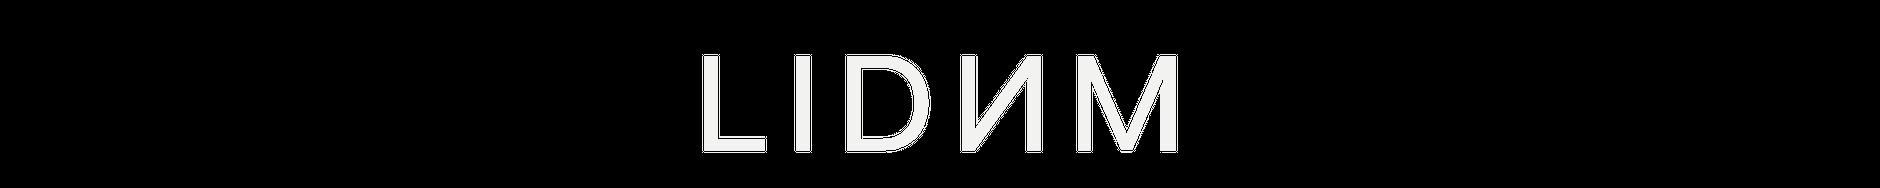 LIDNM(リドム)